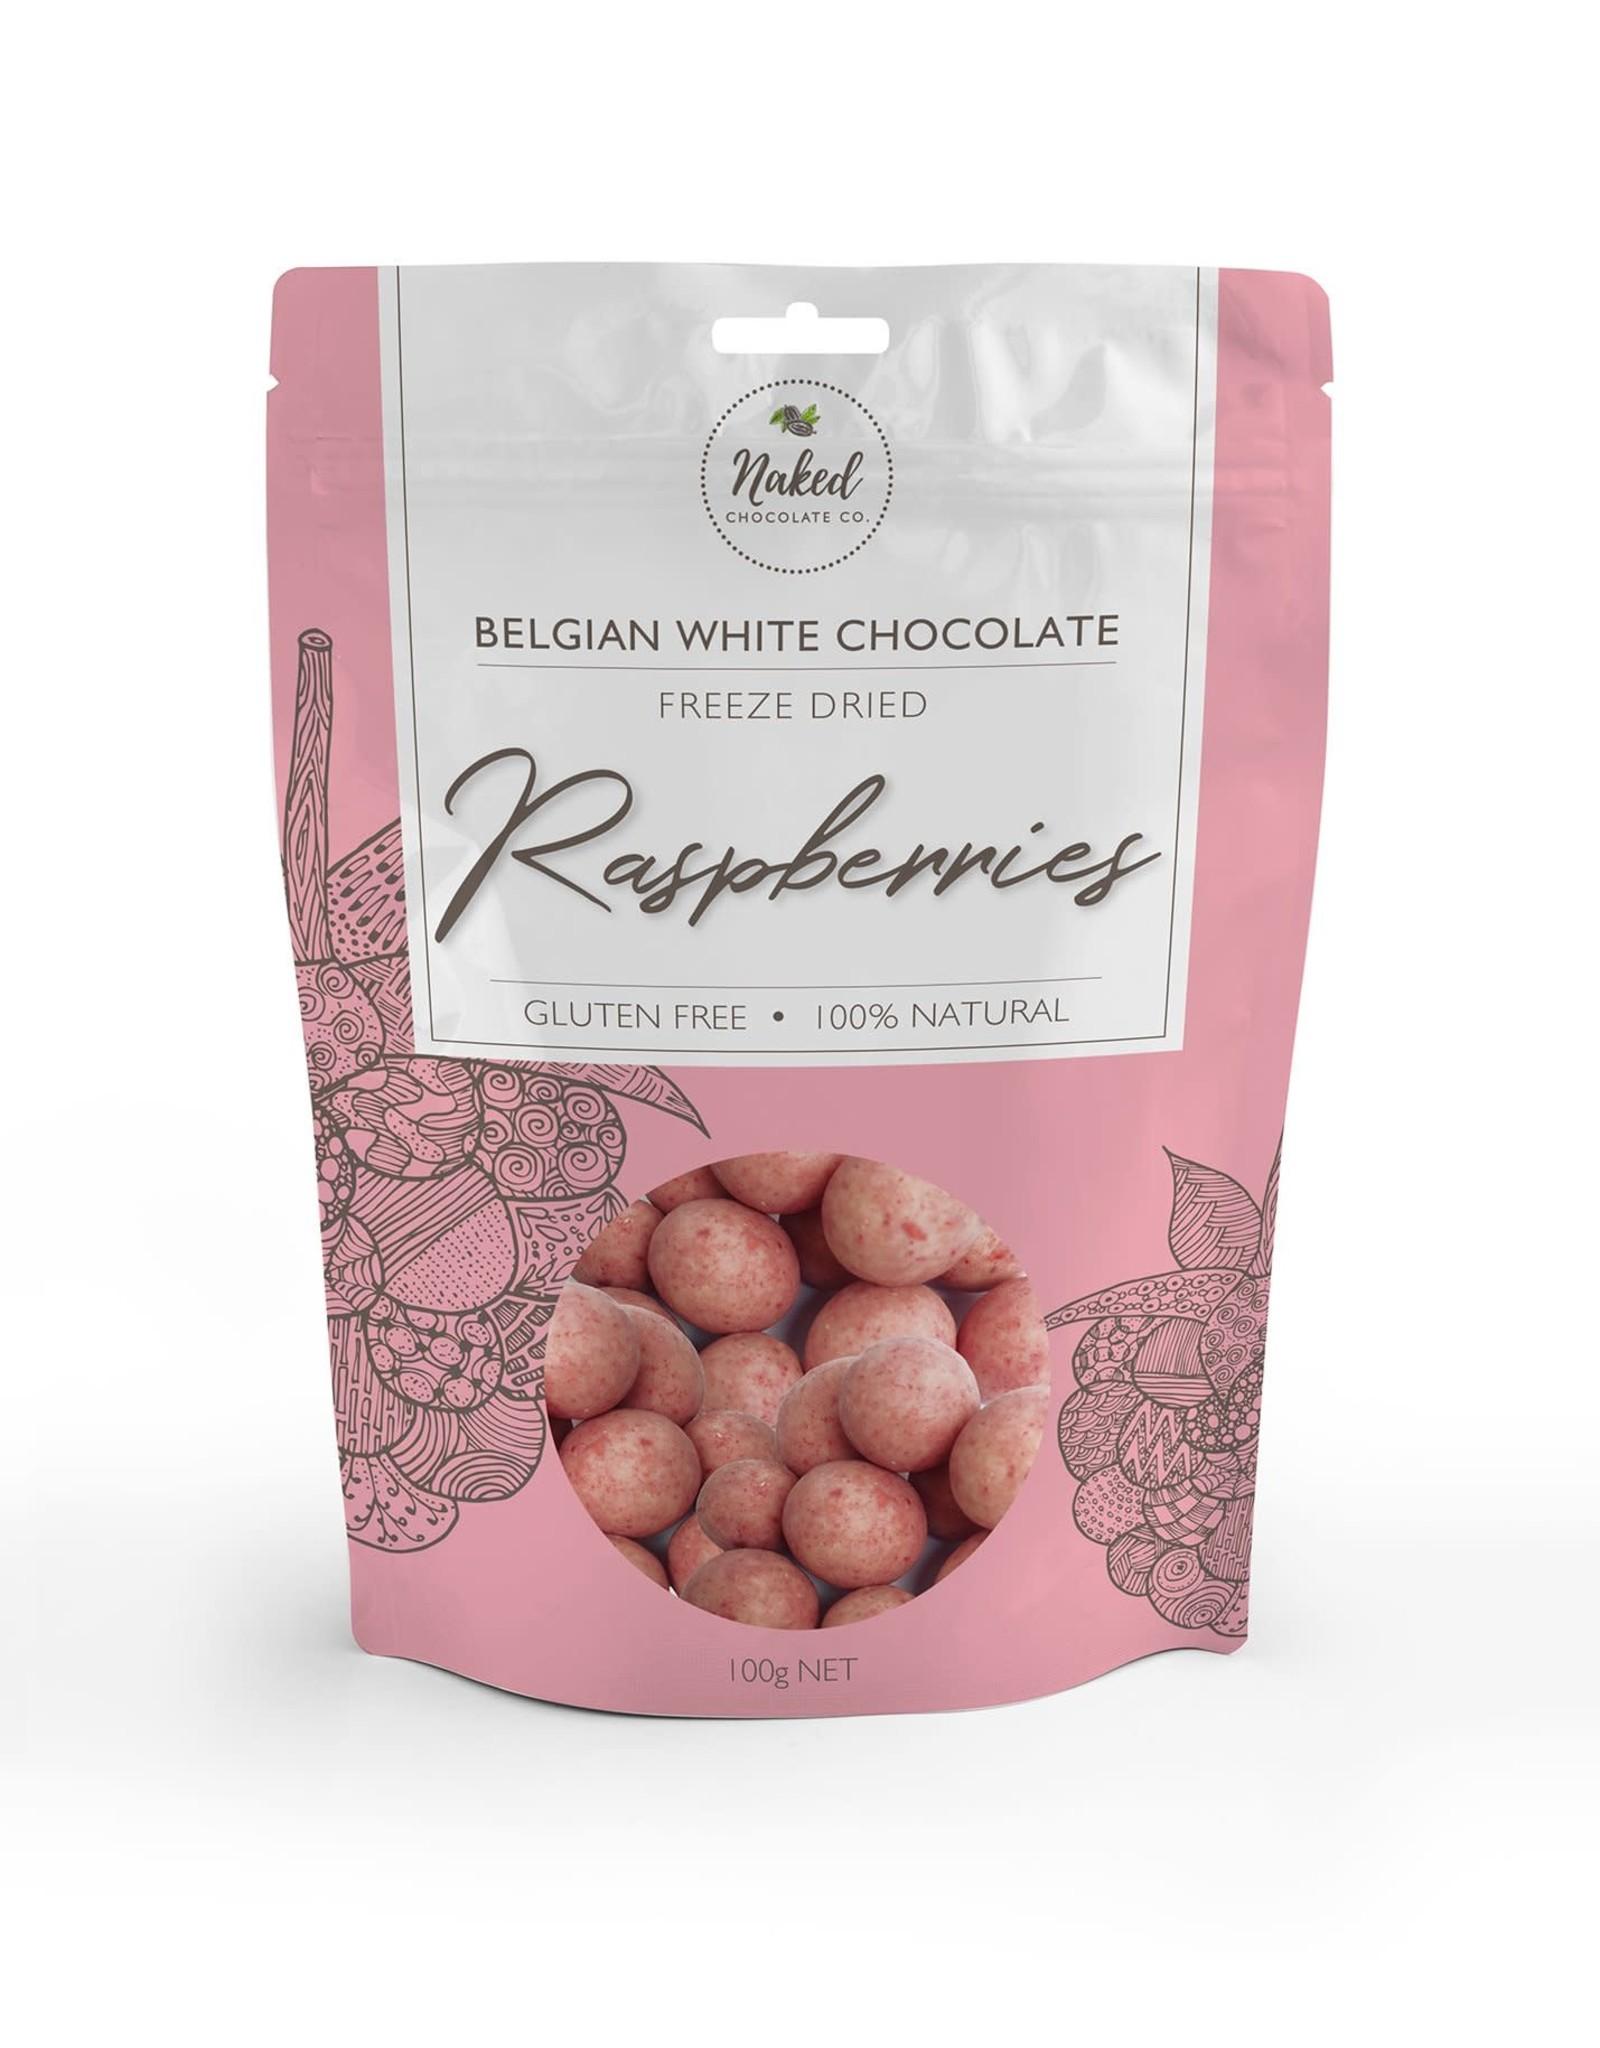 Naked Chocolate Co Freeze Dried Raspberries White Chocolate 125g